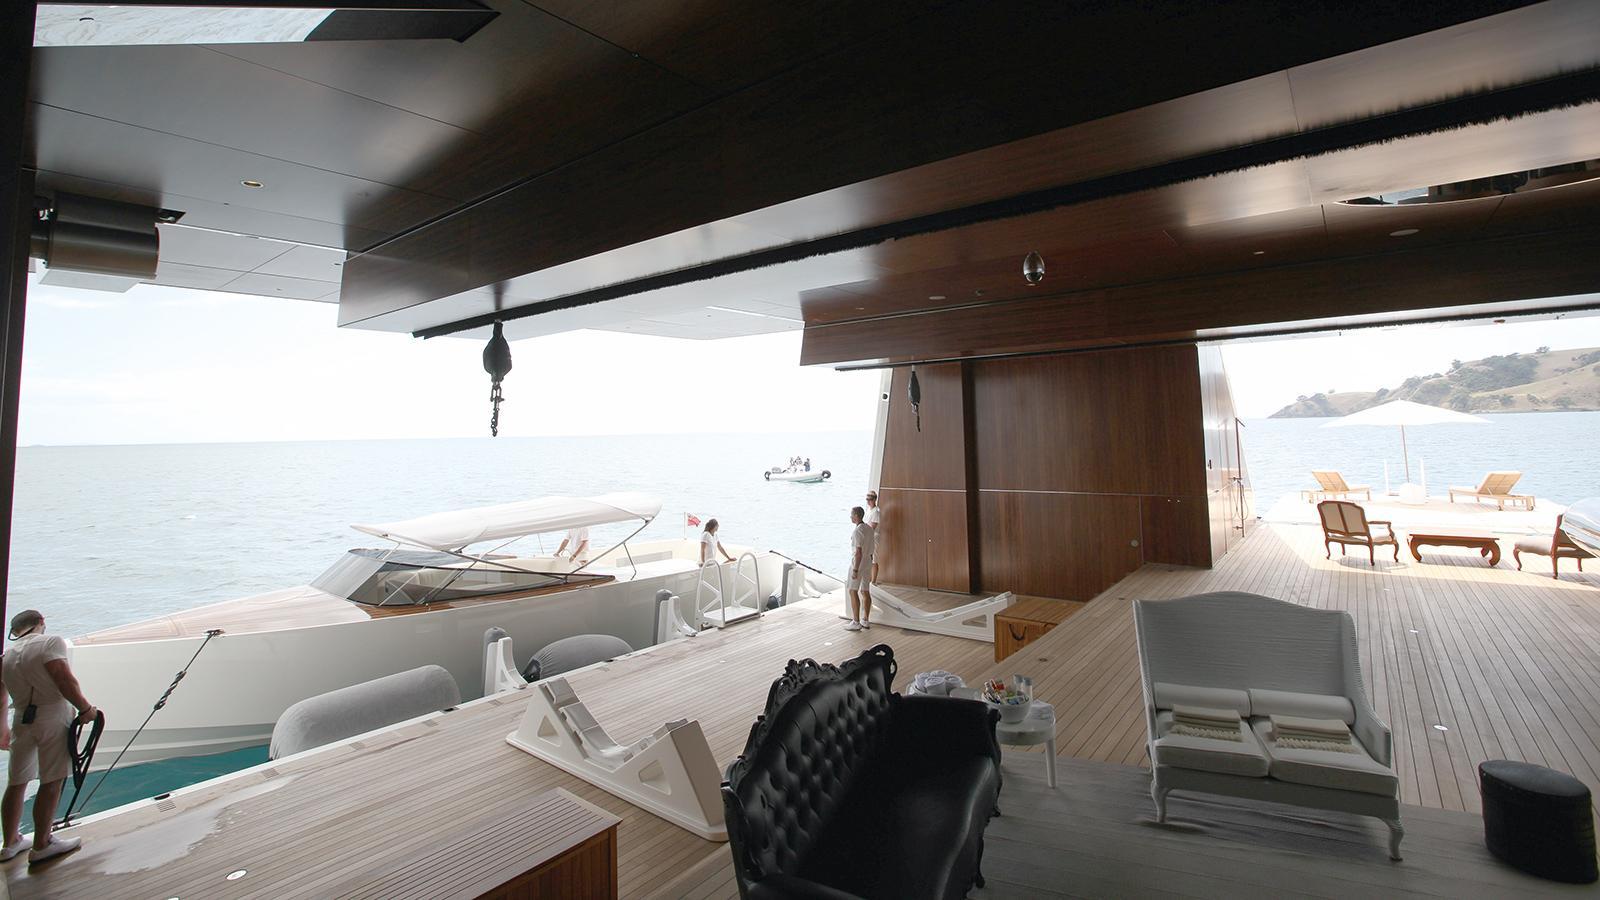 superyacht-a-motor-yacht-blohm-voss-2008-119m-garage